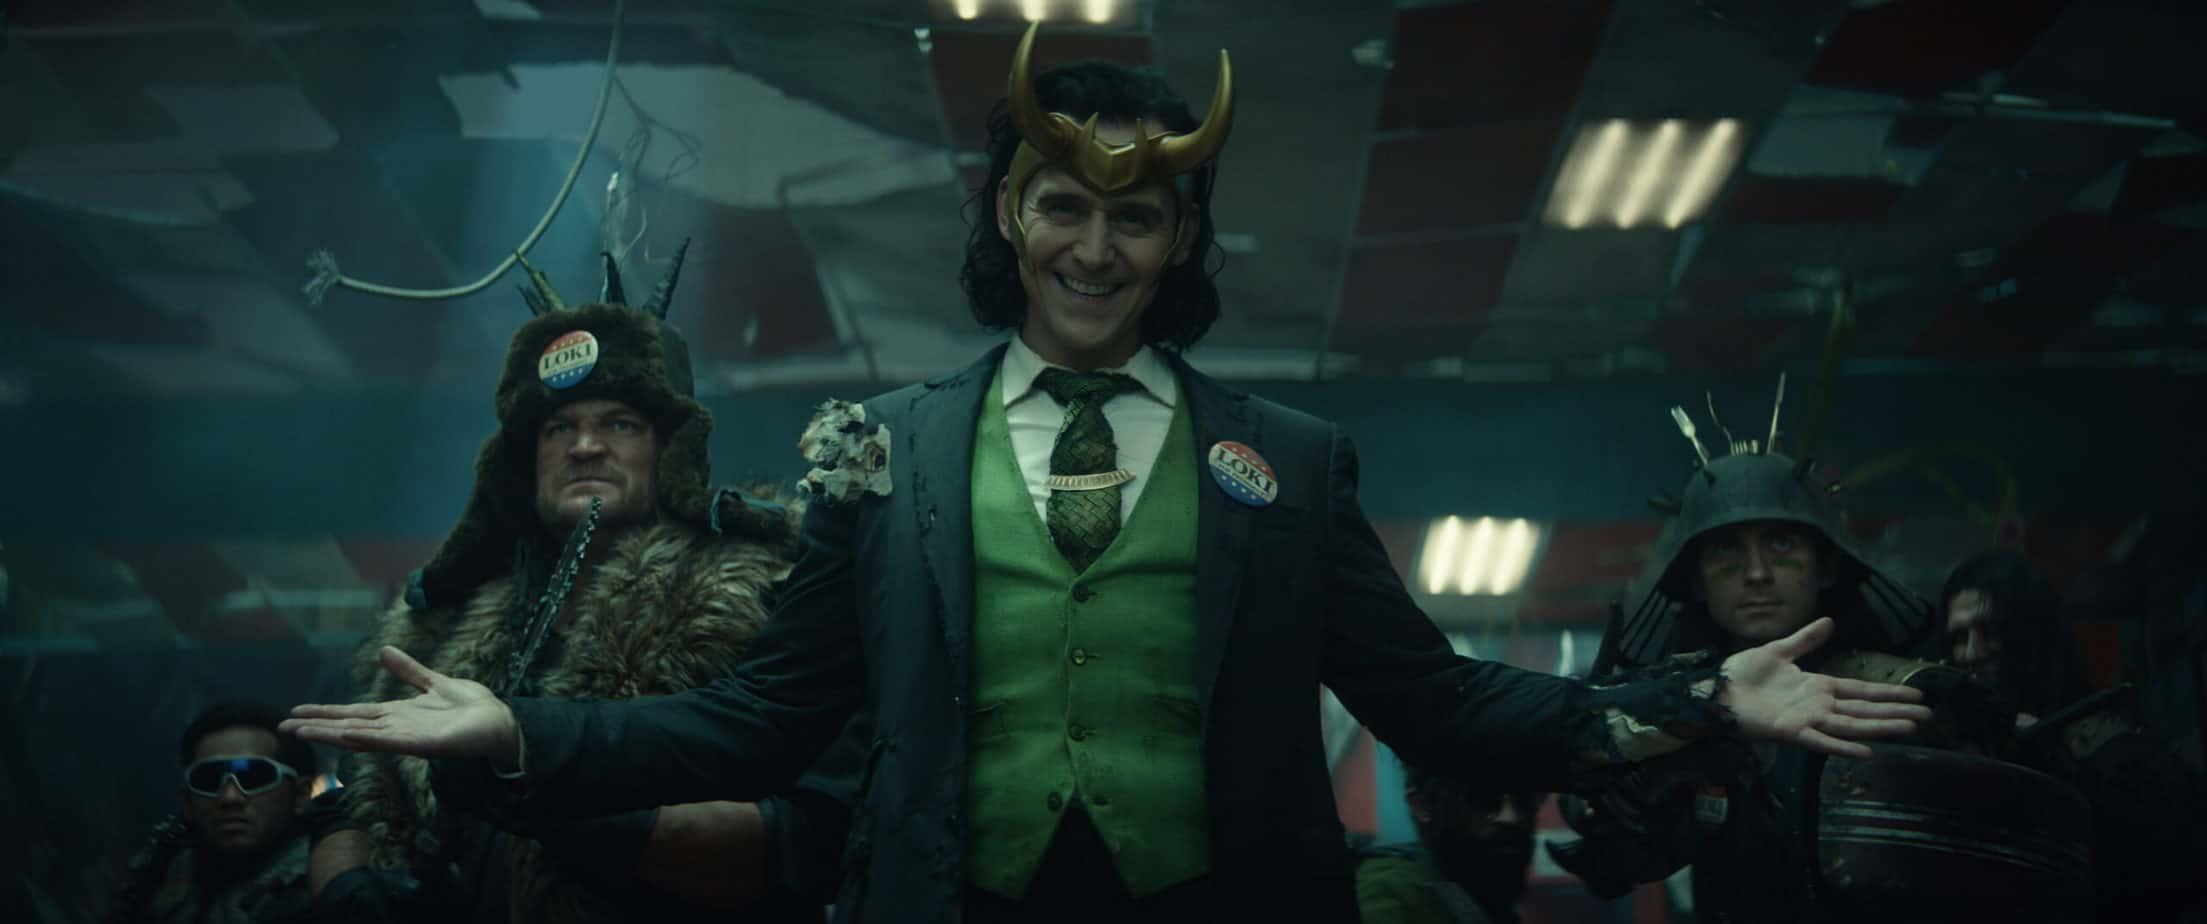 Loki (TomHiddleston) in Marvel Studios' LOKI quotes from the series